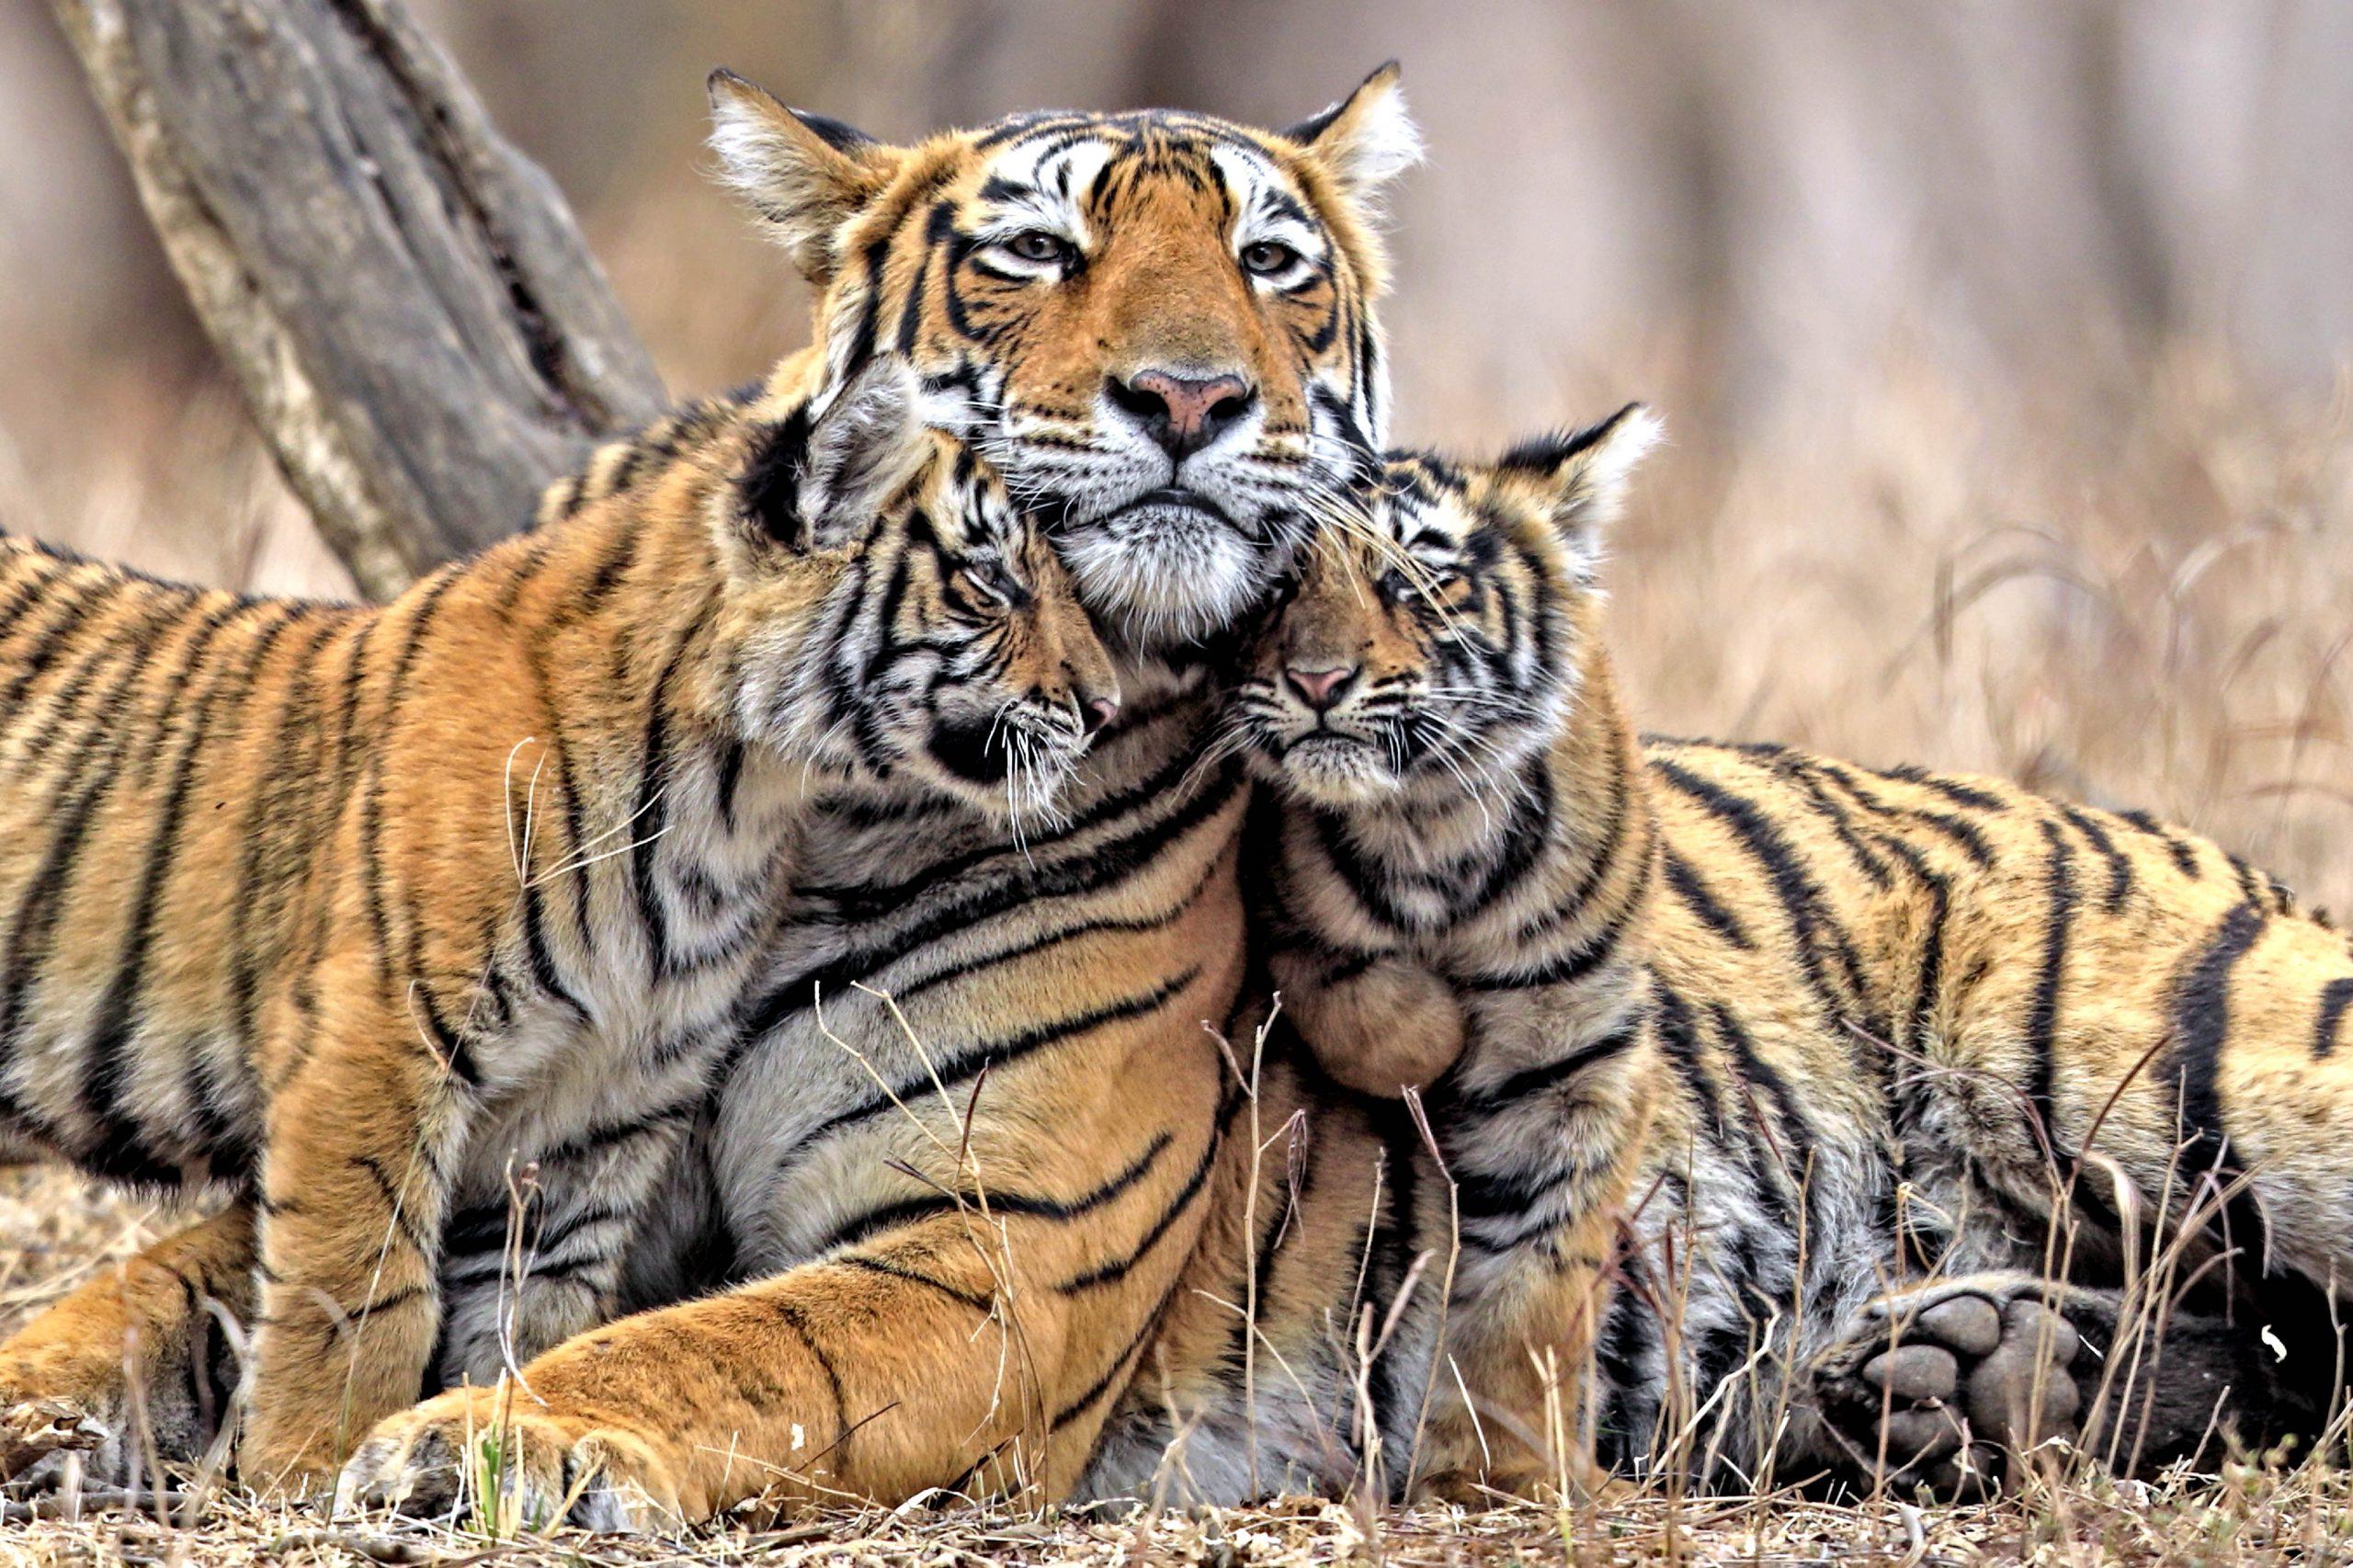 Фото с Тигрицами и Тигрятами